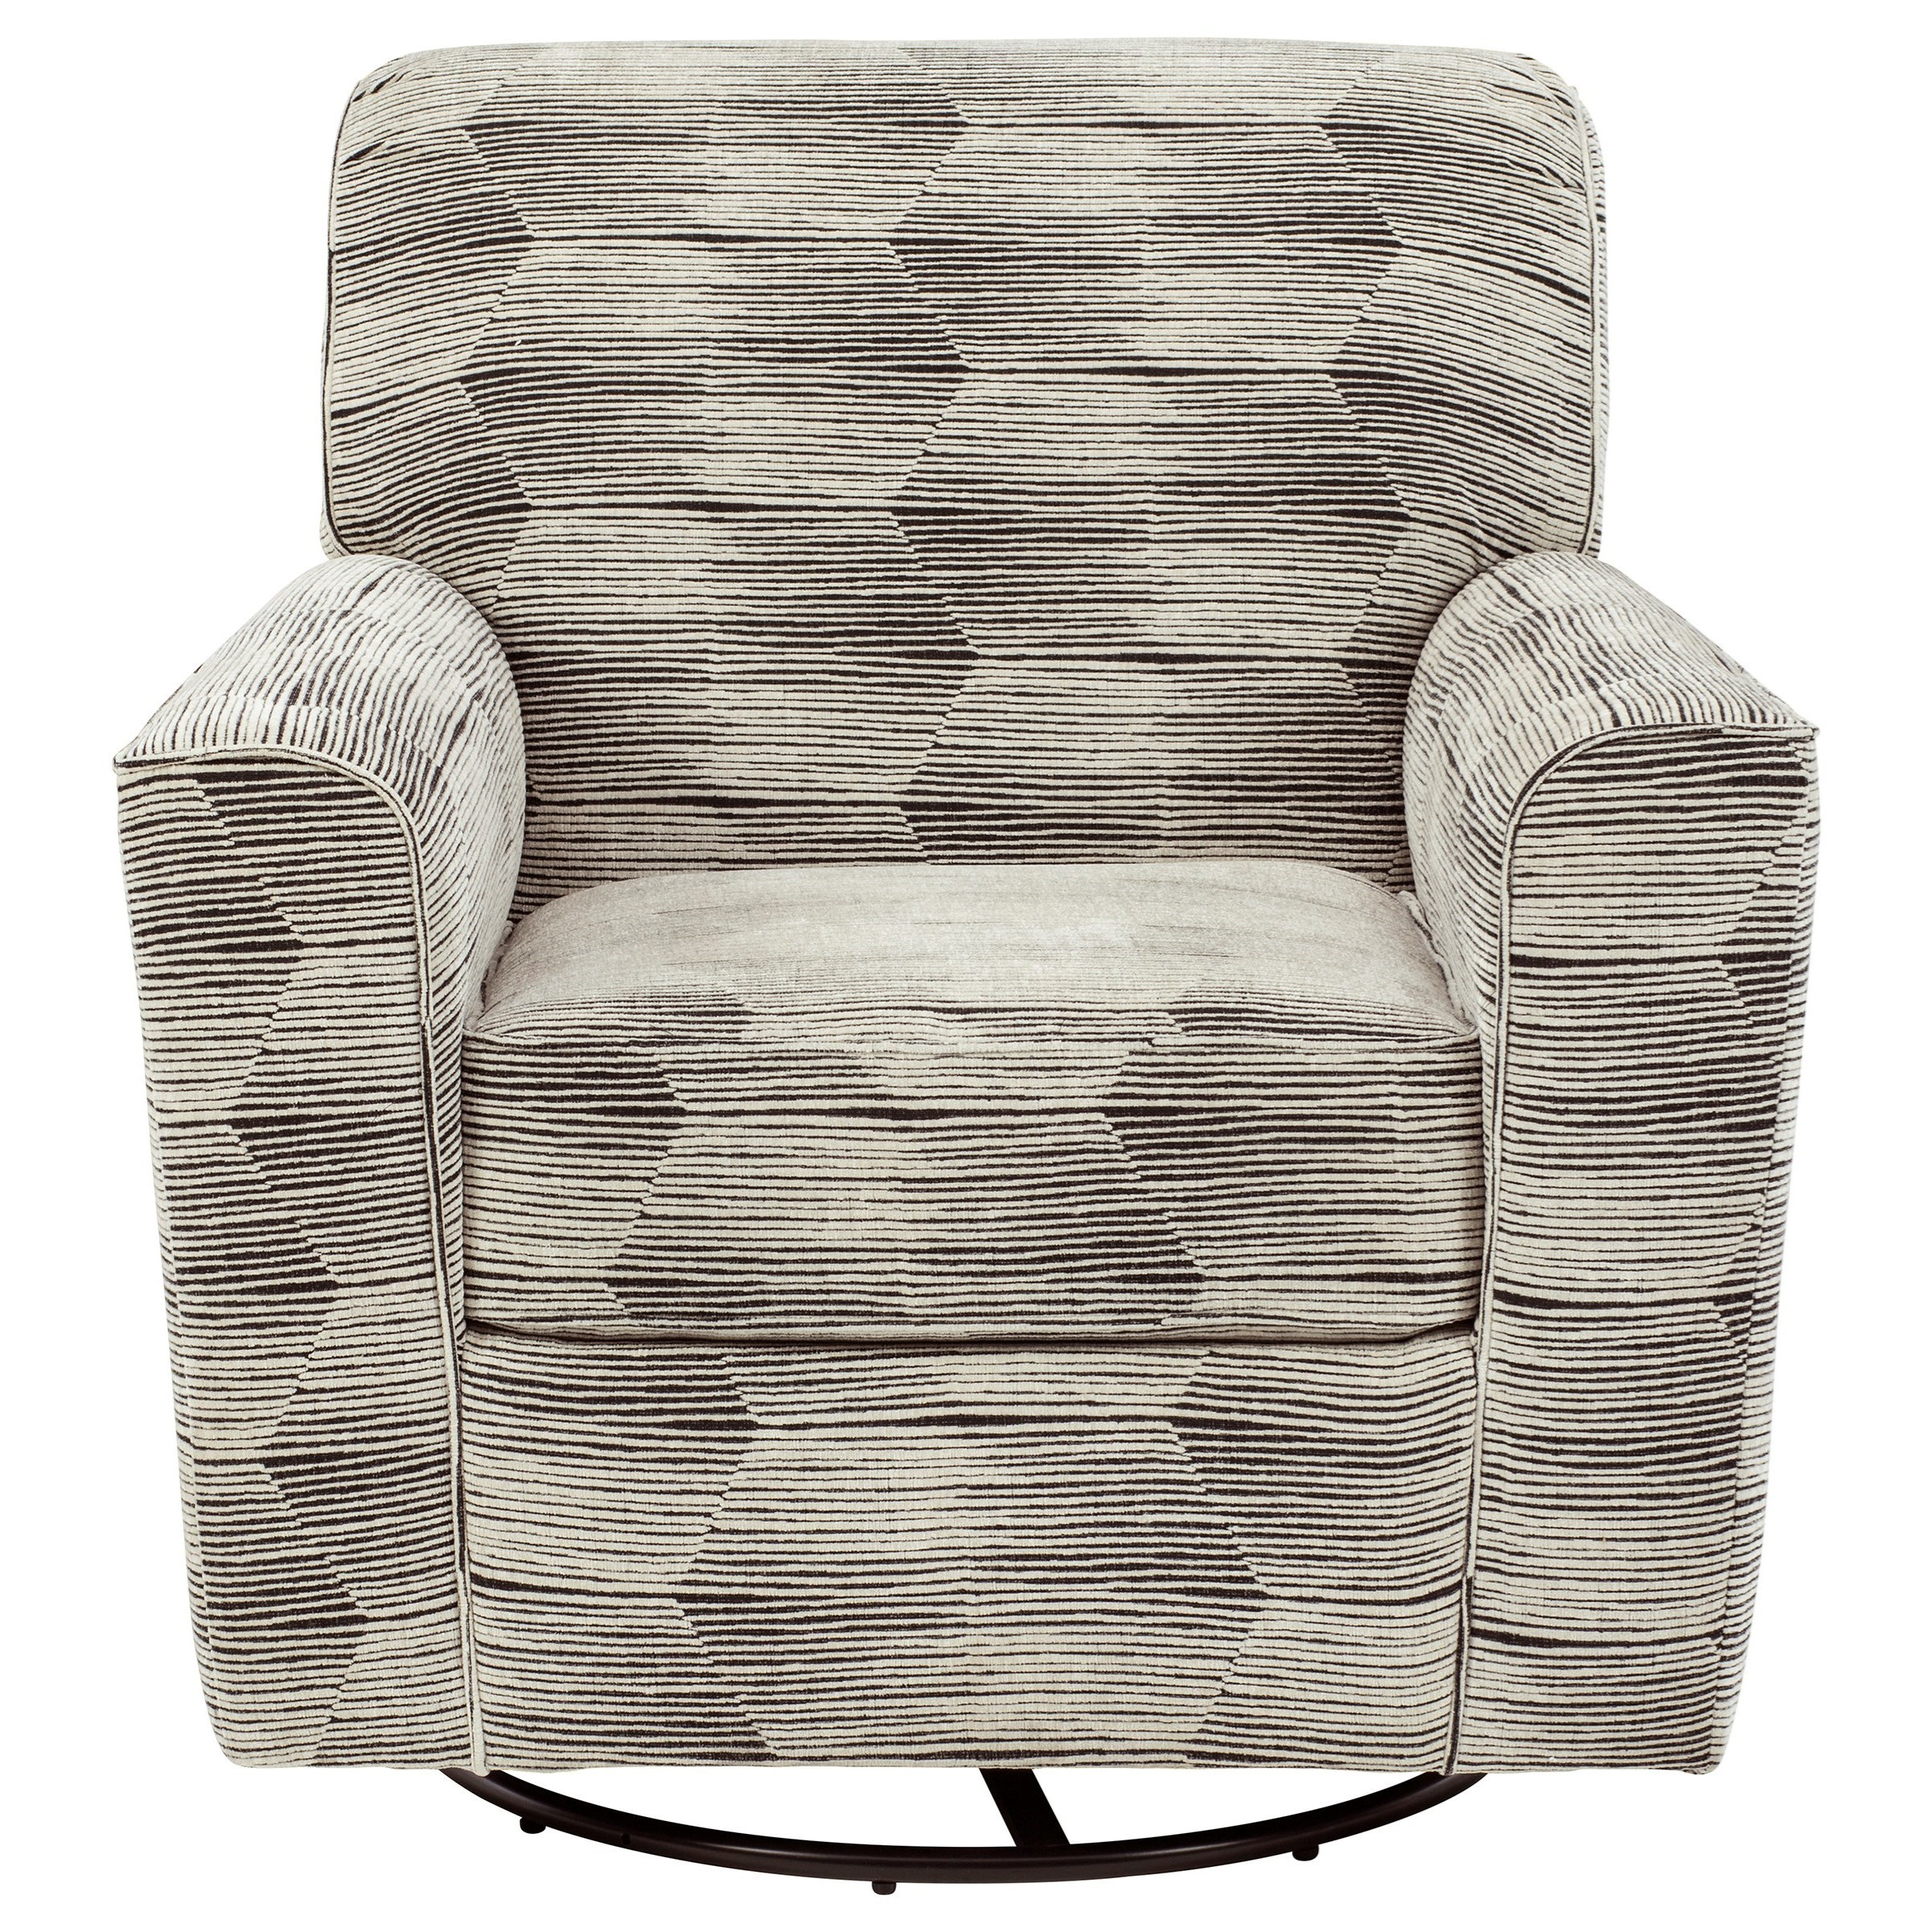 Callisburg Swivel Glider Accent Chair by Benchcraft at Walker's Furniture